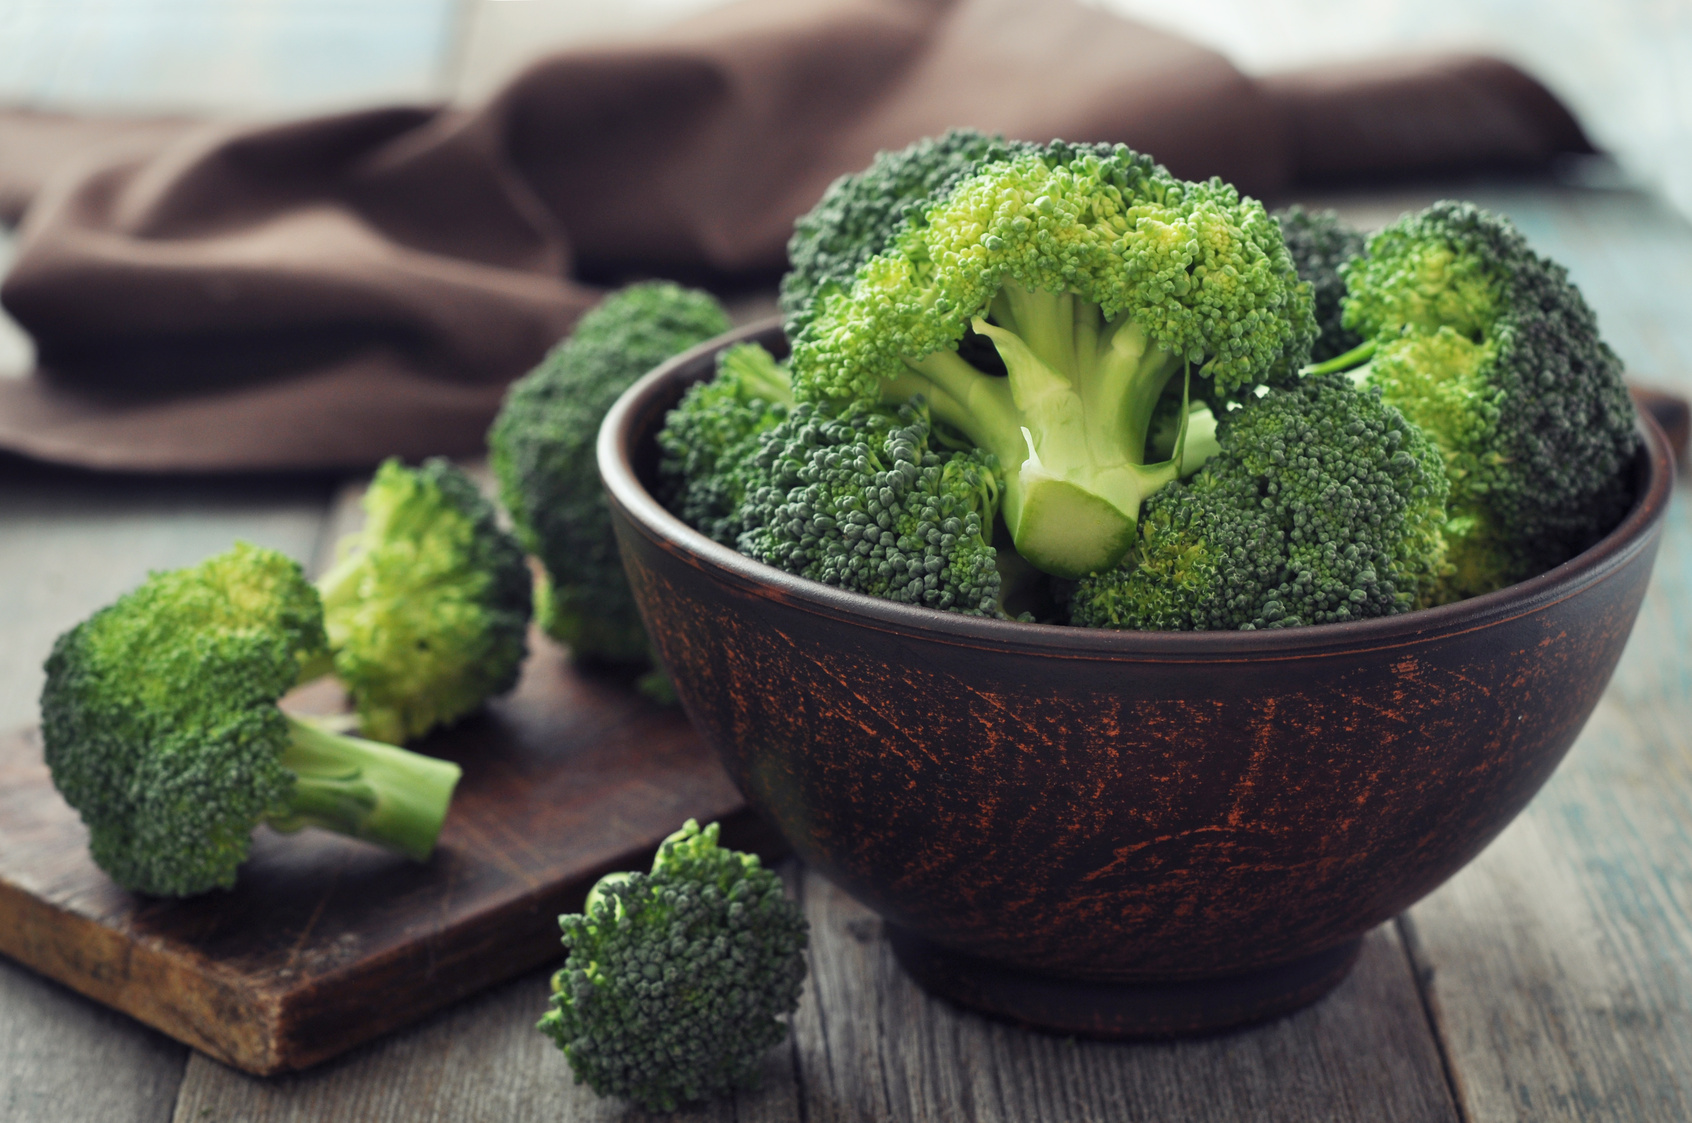 Priorize alimentos naturais